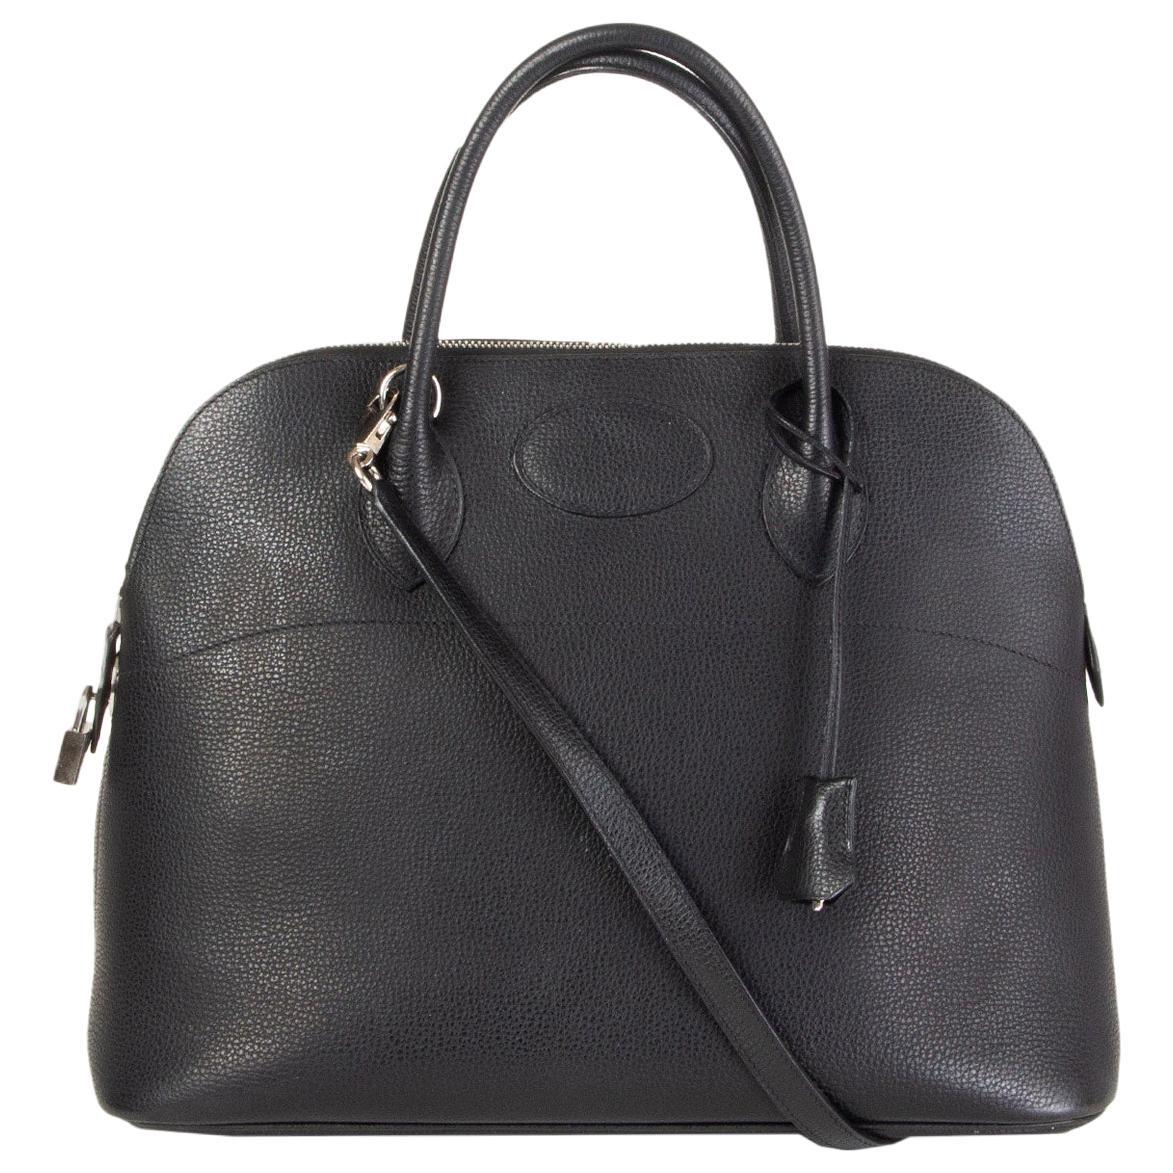 HERMES black Liegee leather BOLIDE 35 Bag